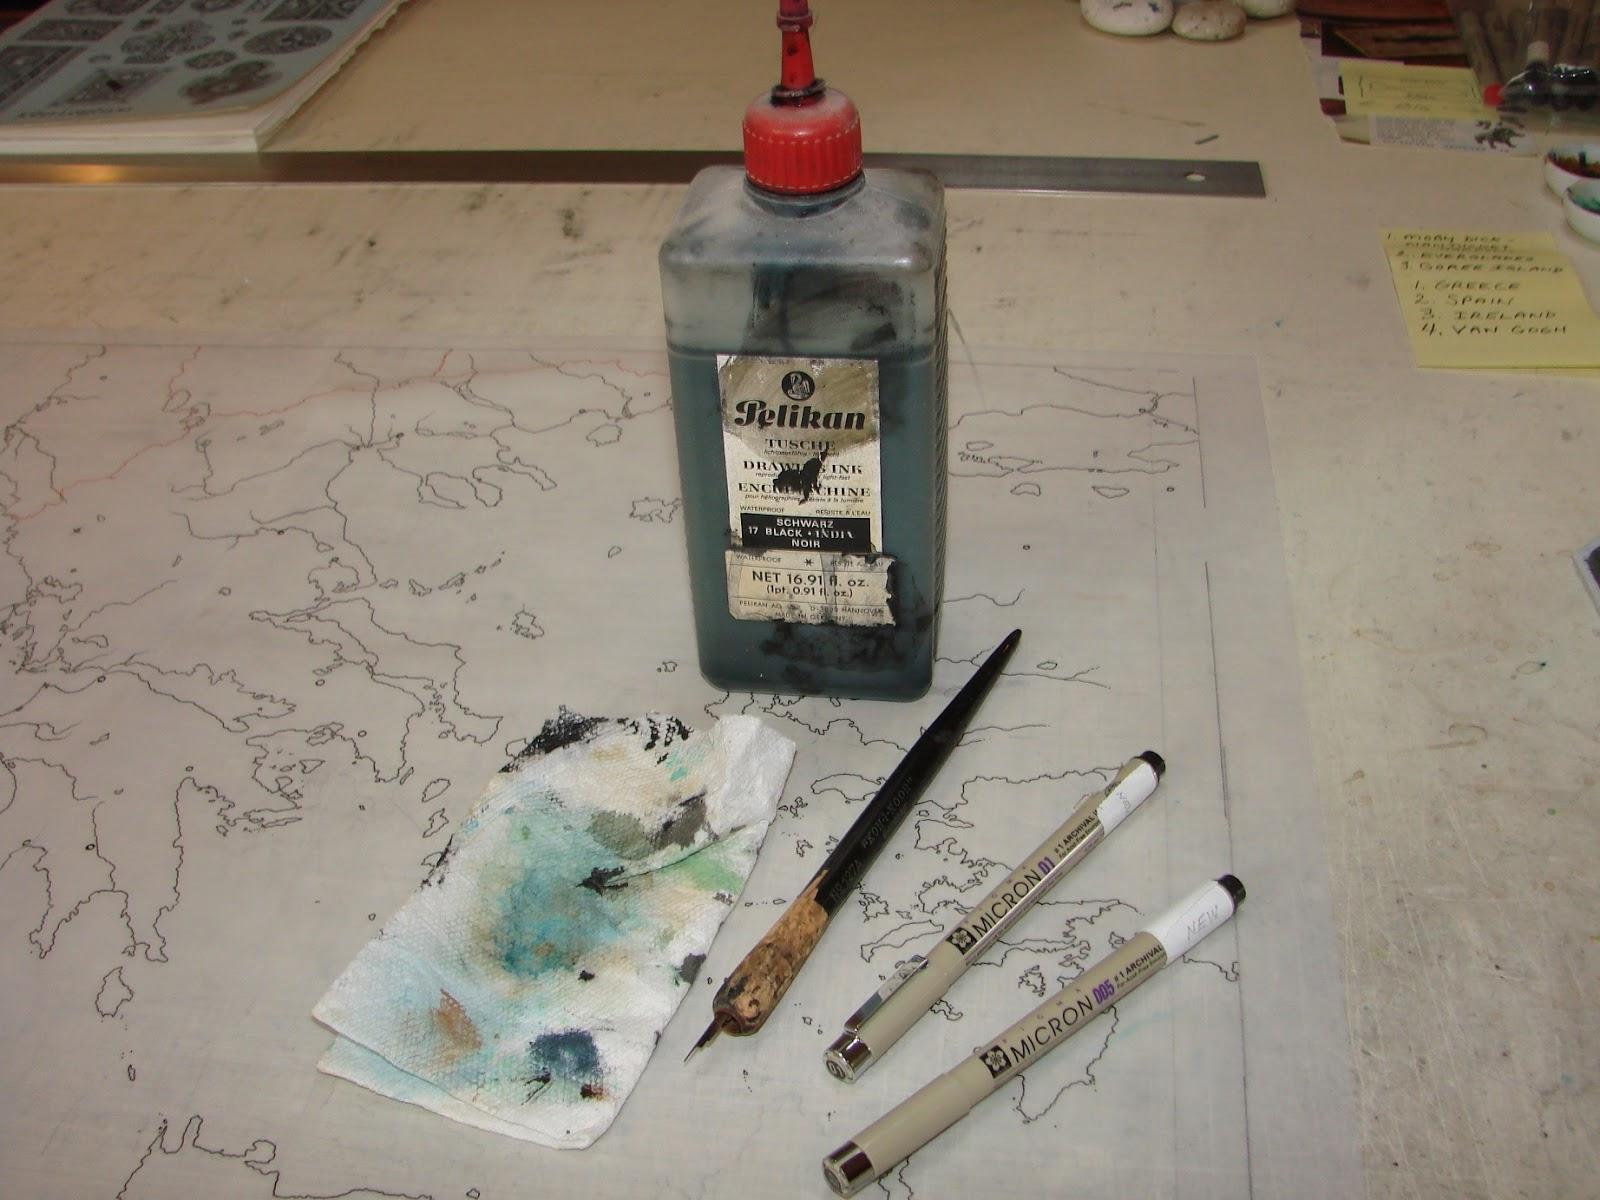 http://3.bp.blogspot.com/-aBYiMRfn3qo/UREHKOvmEII/AAAAAAAAHJQ/oniBP508KGw/s1600/Mike+Reagan+Studio+Pens+&+ink.jpg